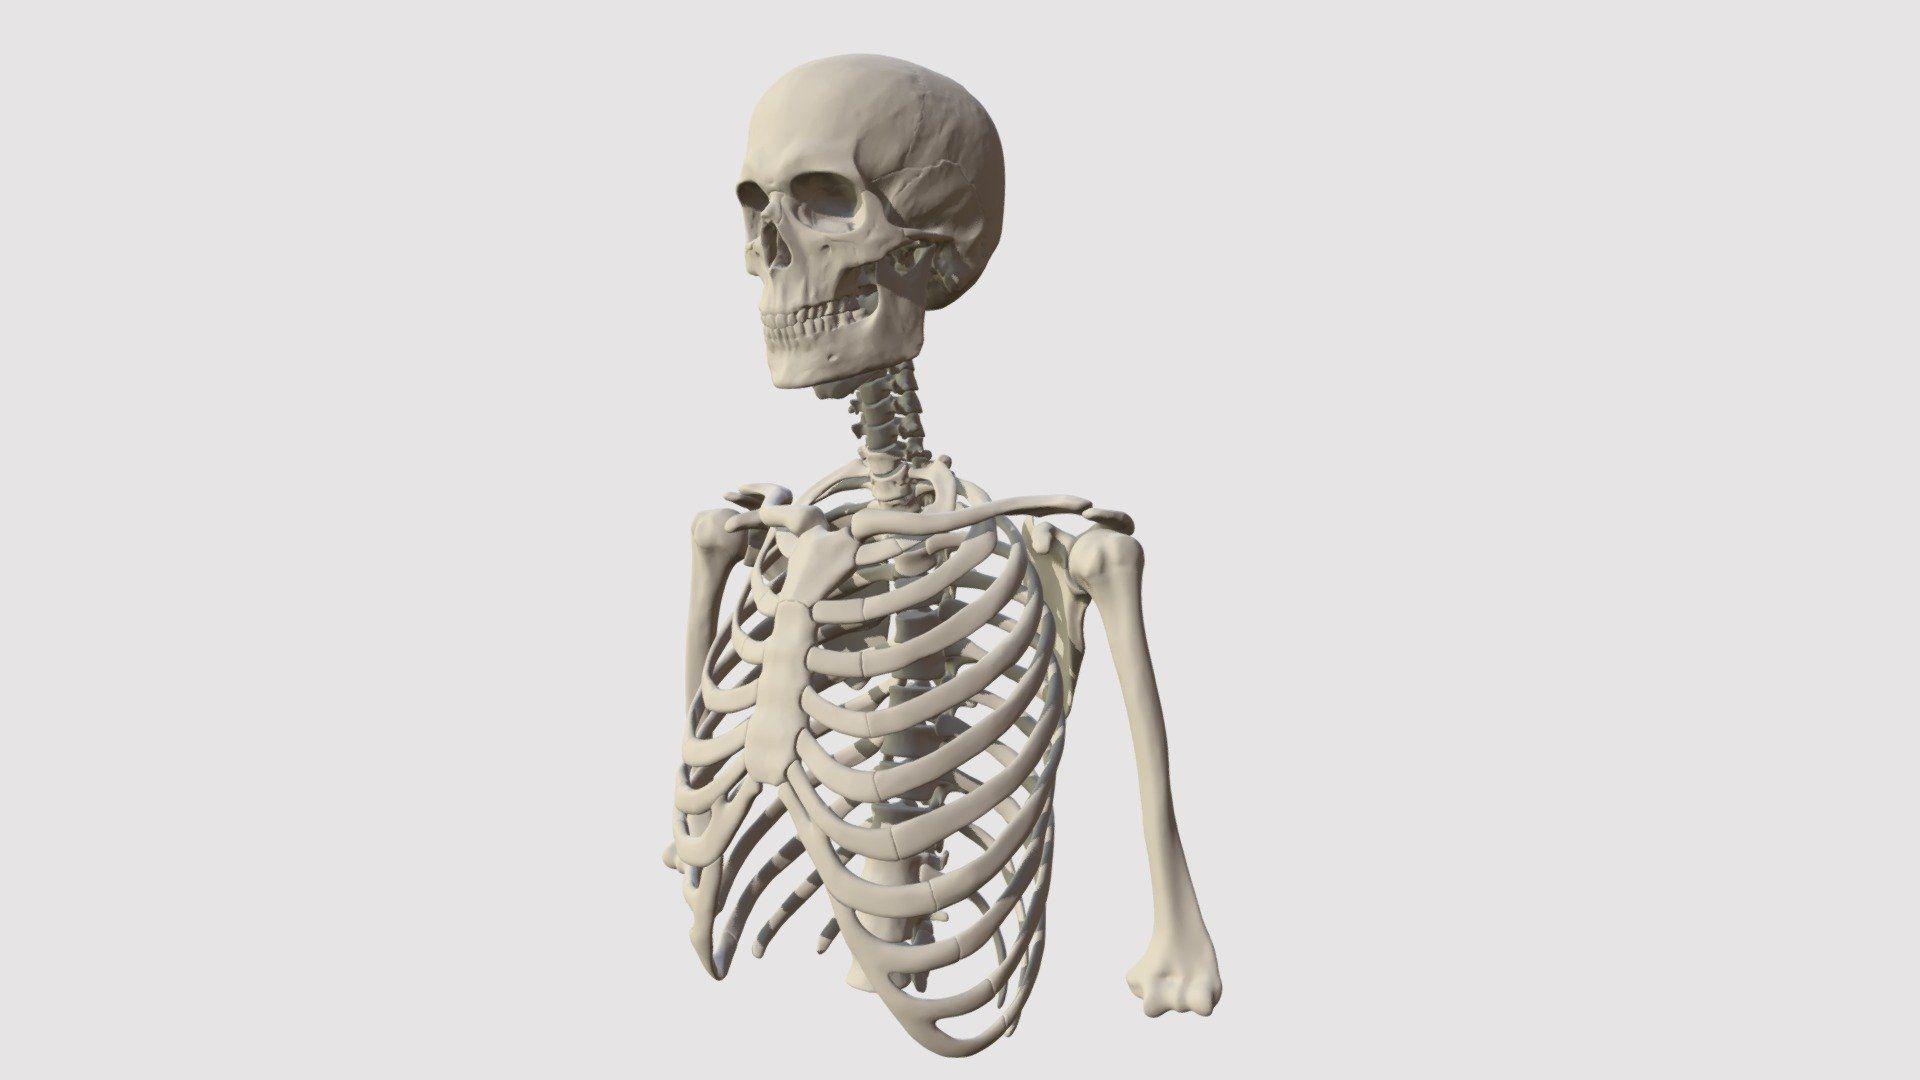 Großzügig Atlas Anatomie Menschliche Körper Ideen - Anatomie Ideen ...